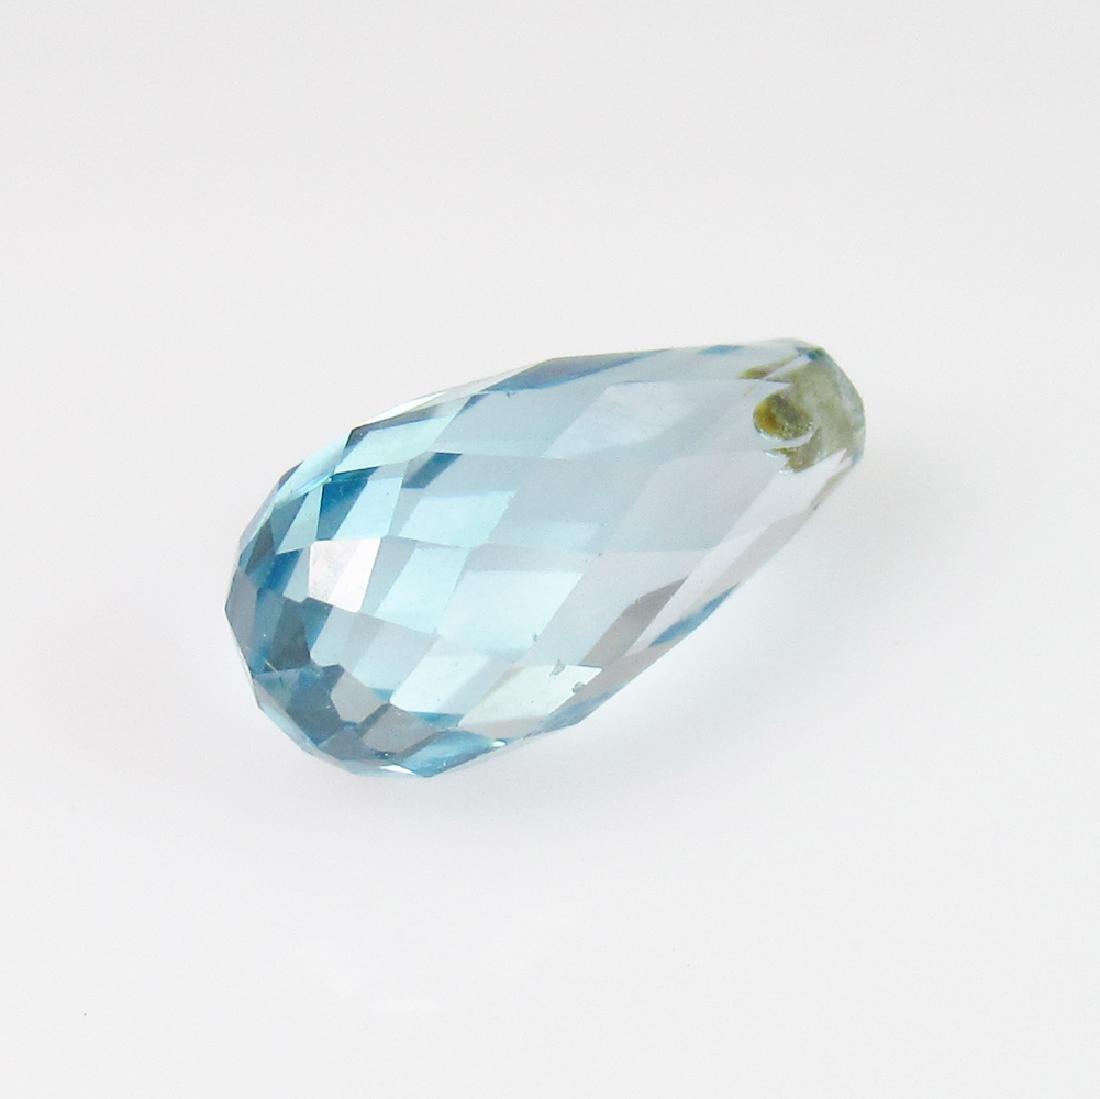 4.02 Ct Genuine Blue Topaz Pear Drop Drilled